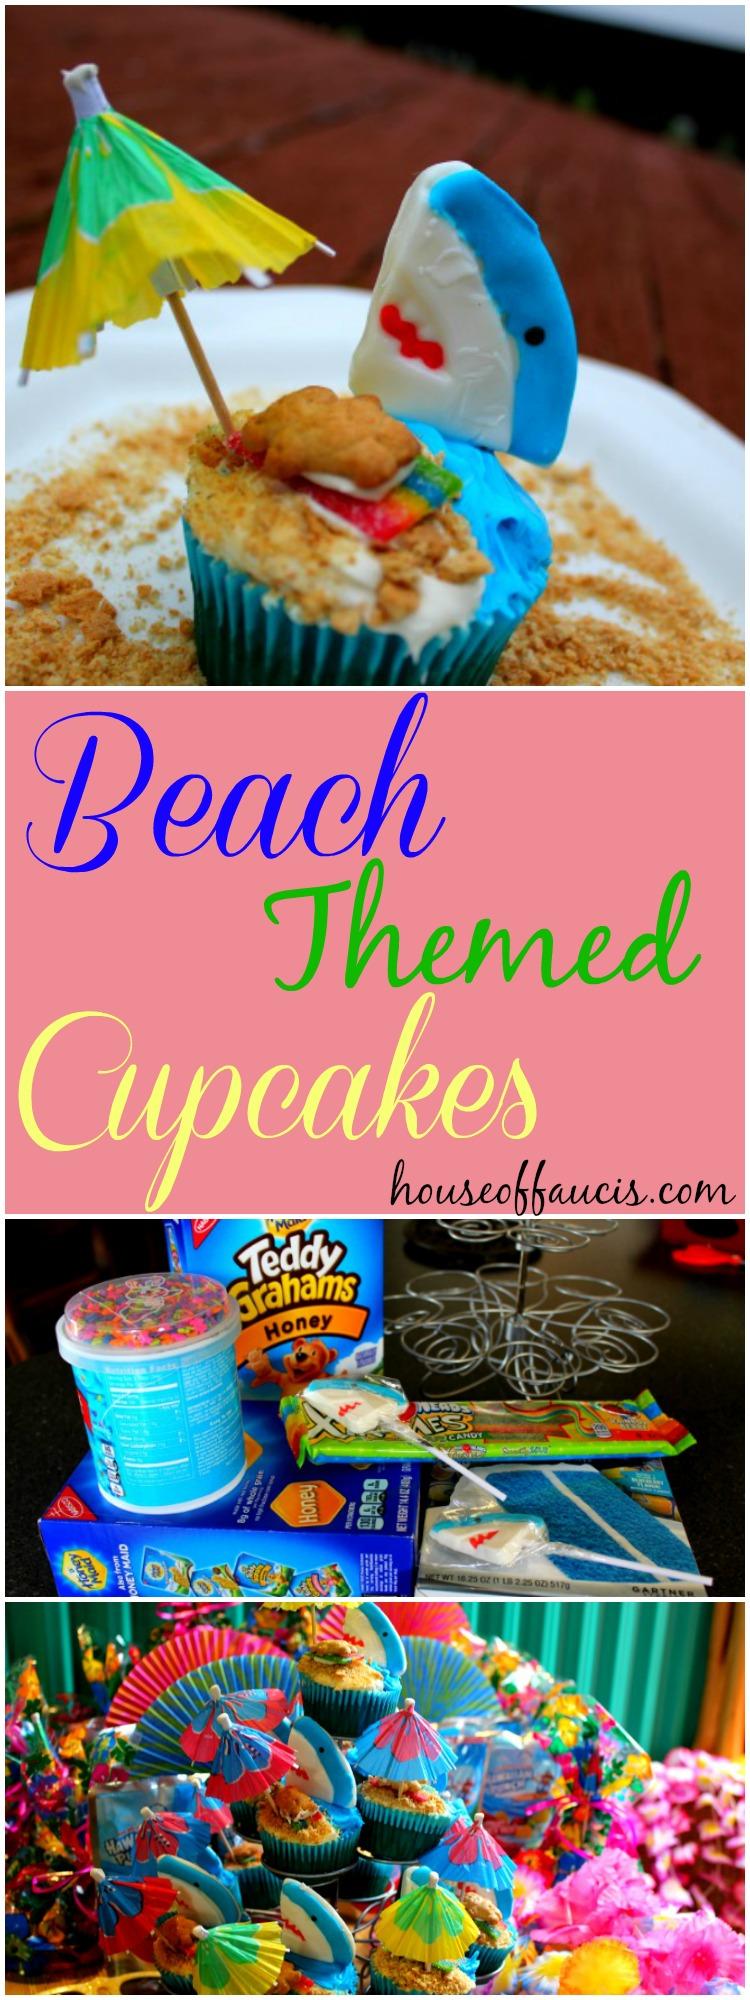 Inspiring Med Beach Cupcakes Beach Med Cupcakes House Beach Med Cakes Bridal Shower Beach Med Cakes wedding cake Beach Themed Cakes